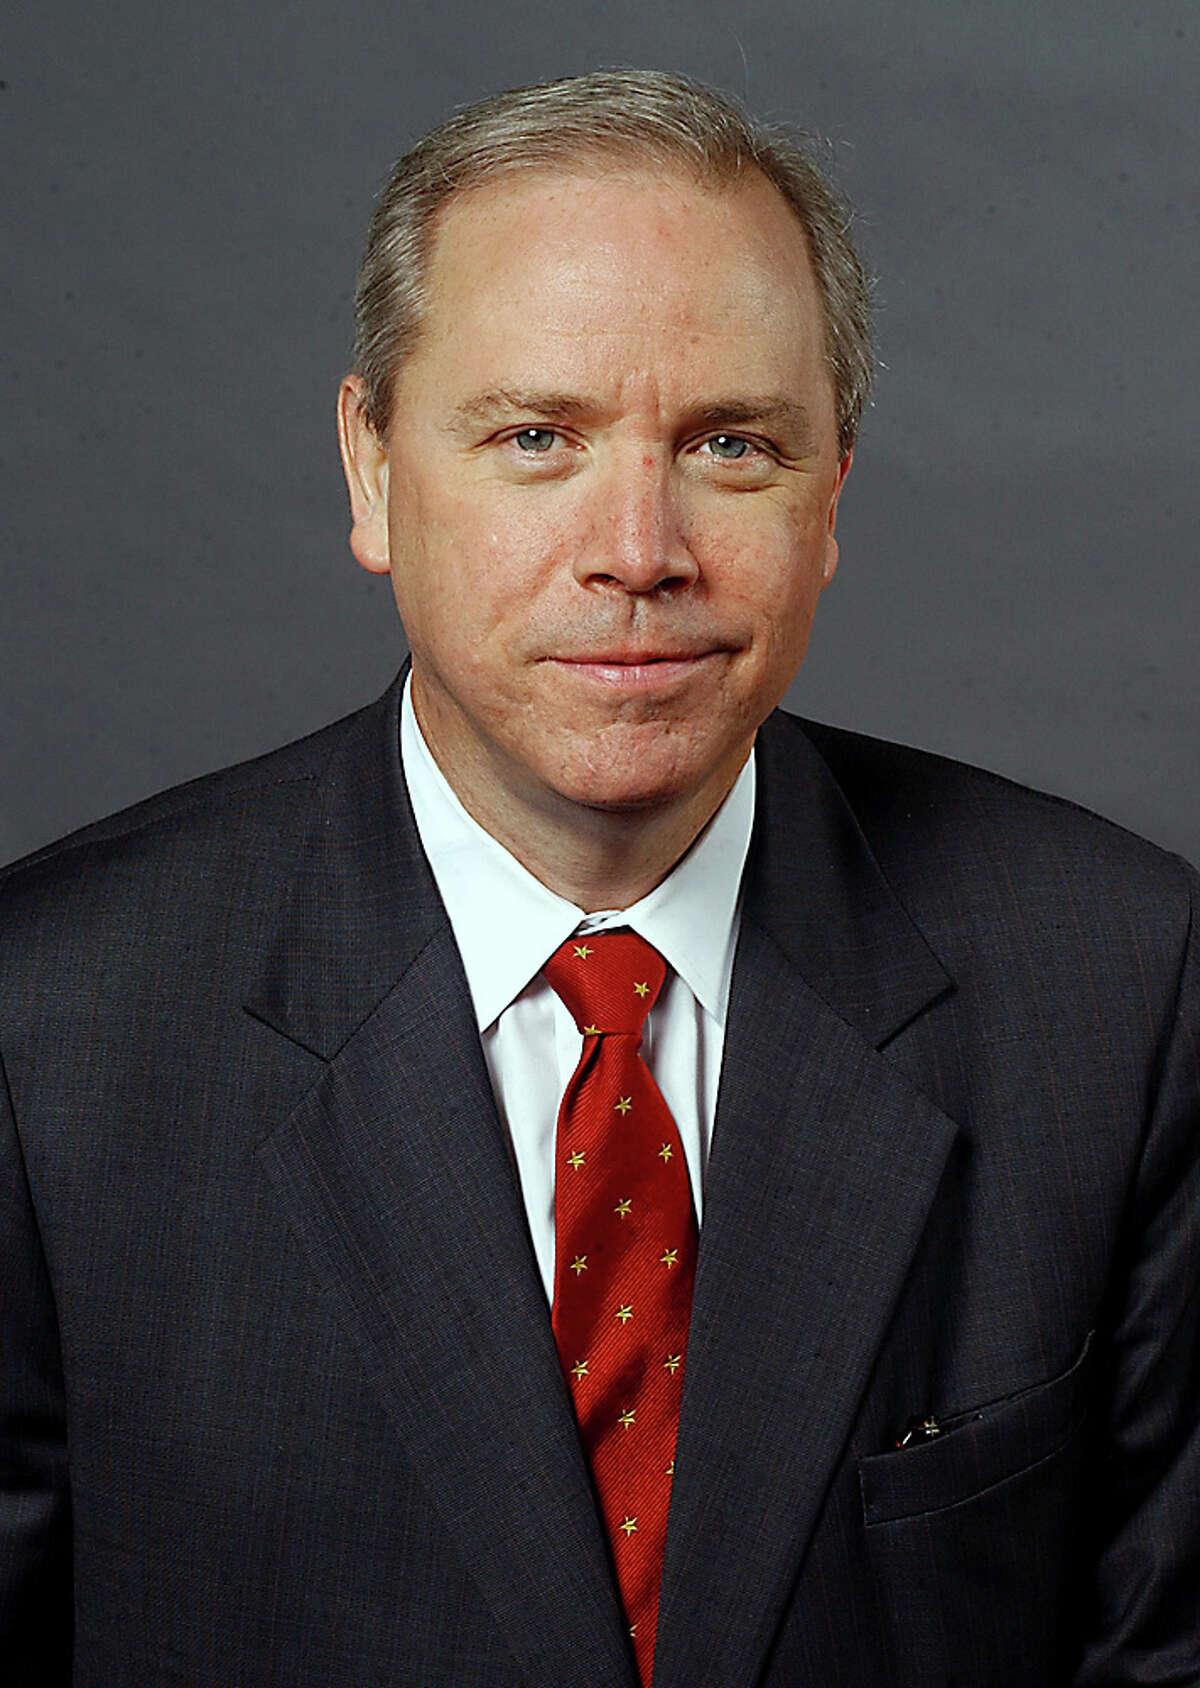 Gary Elkins, Texas House Representative, R-Houston, on Wednesday, January 29, 2003.